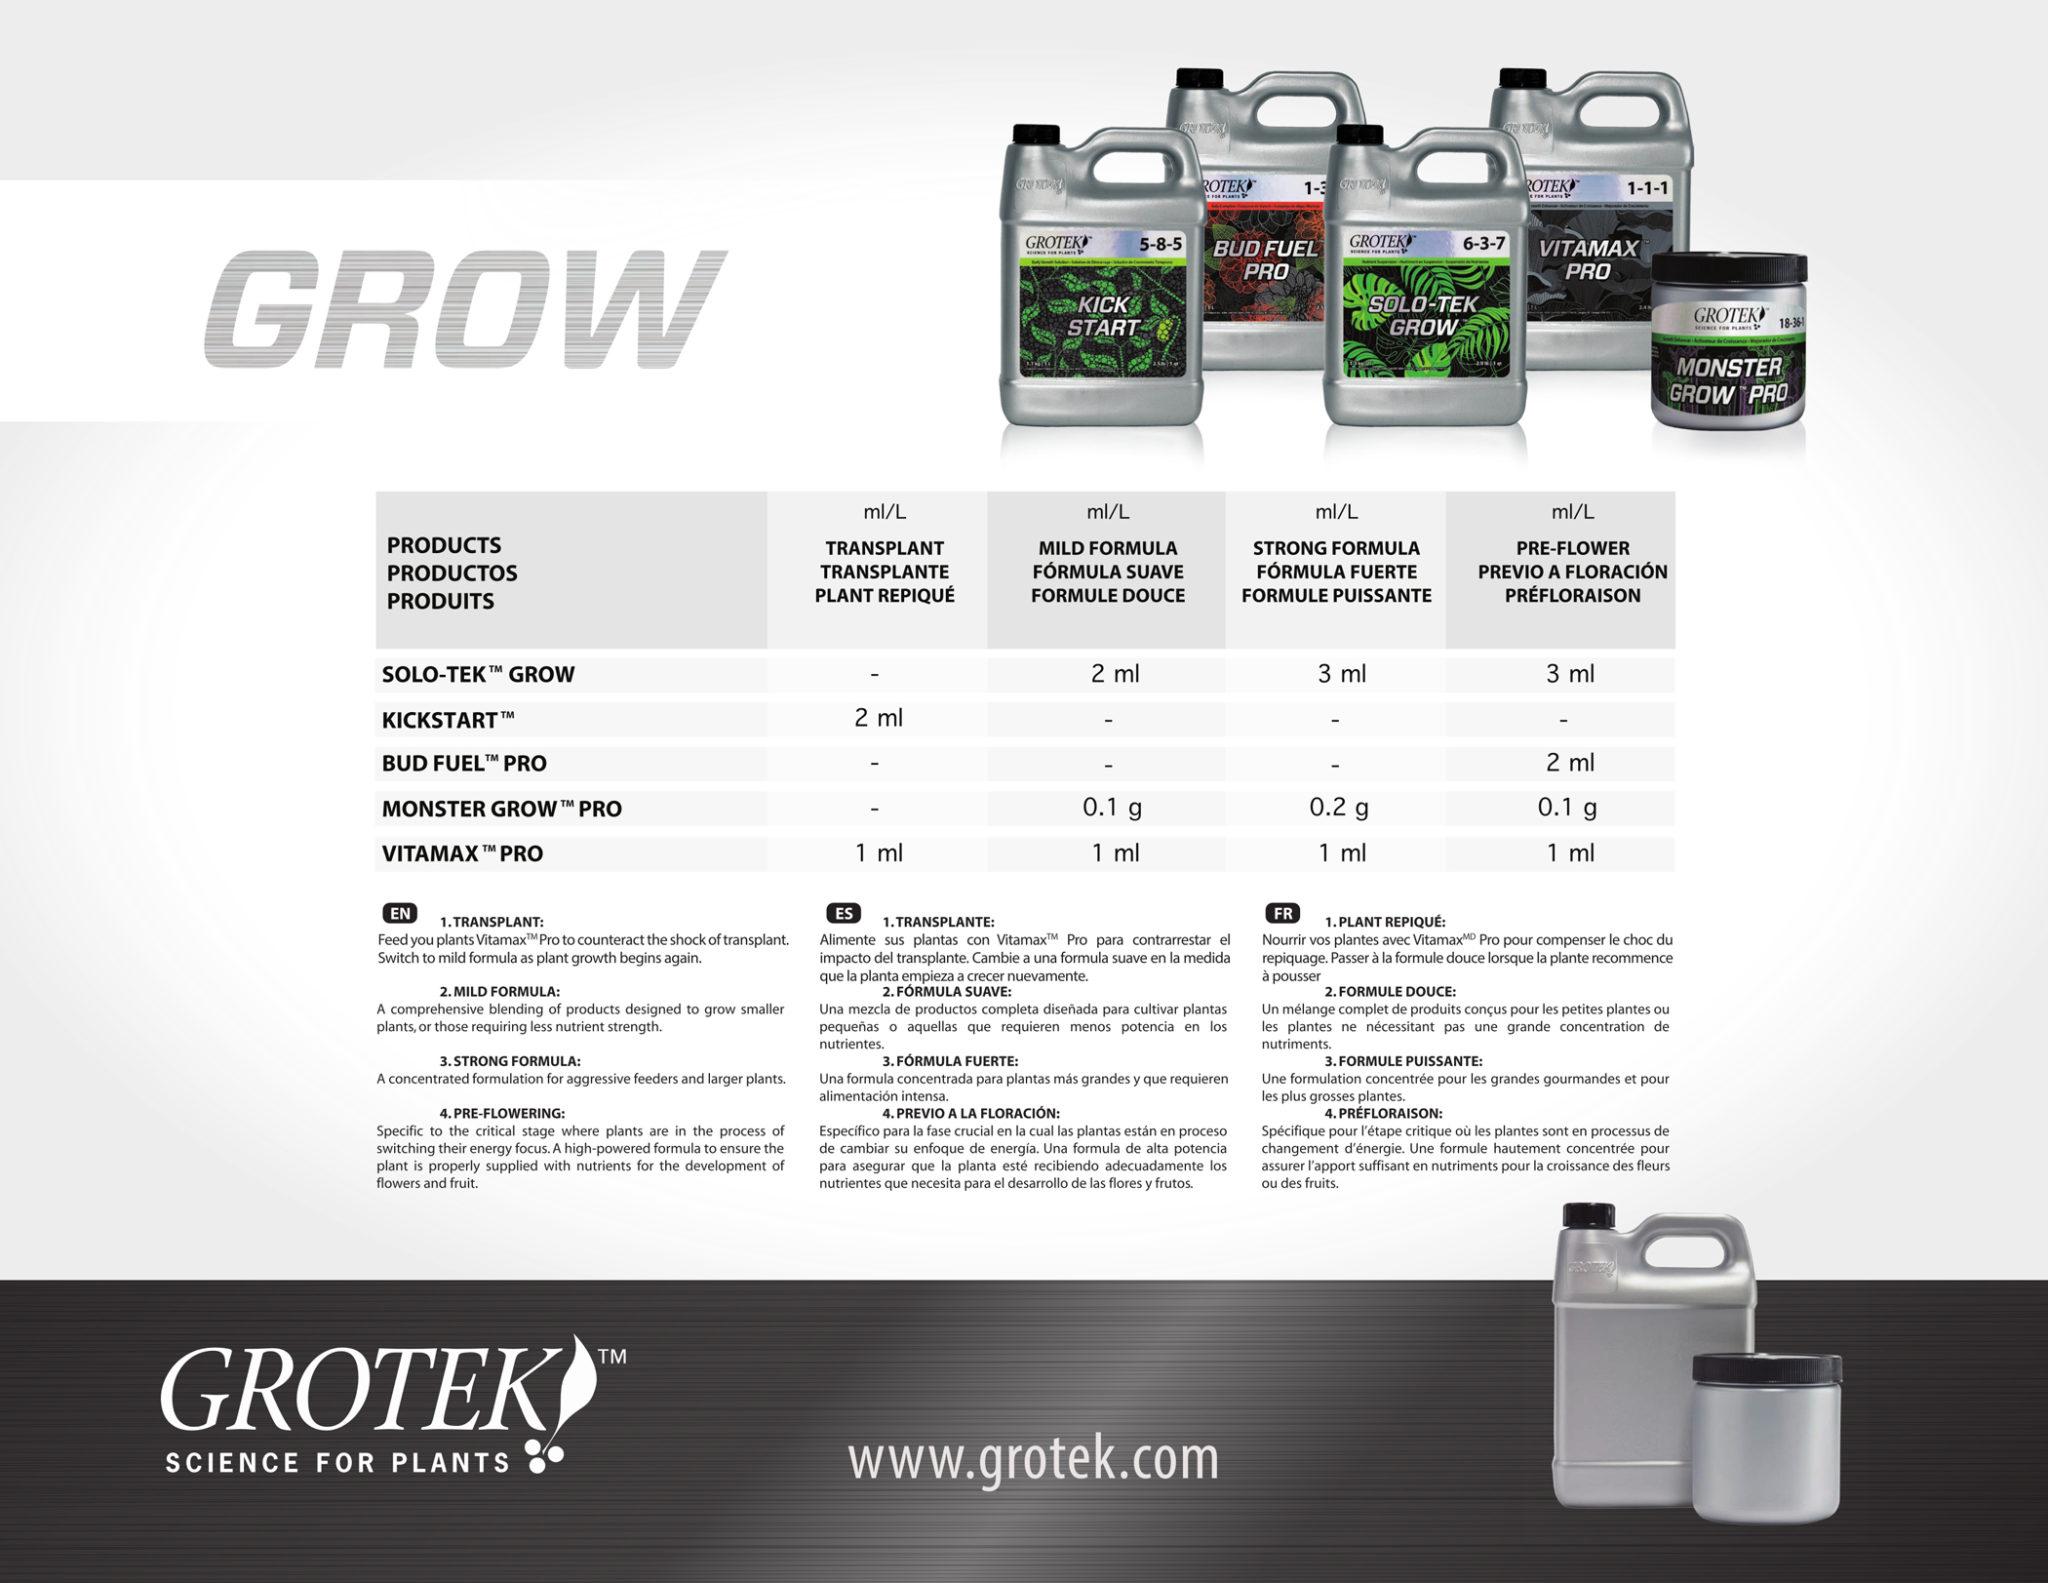 Grotek Grow